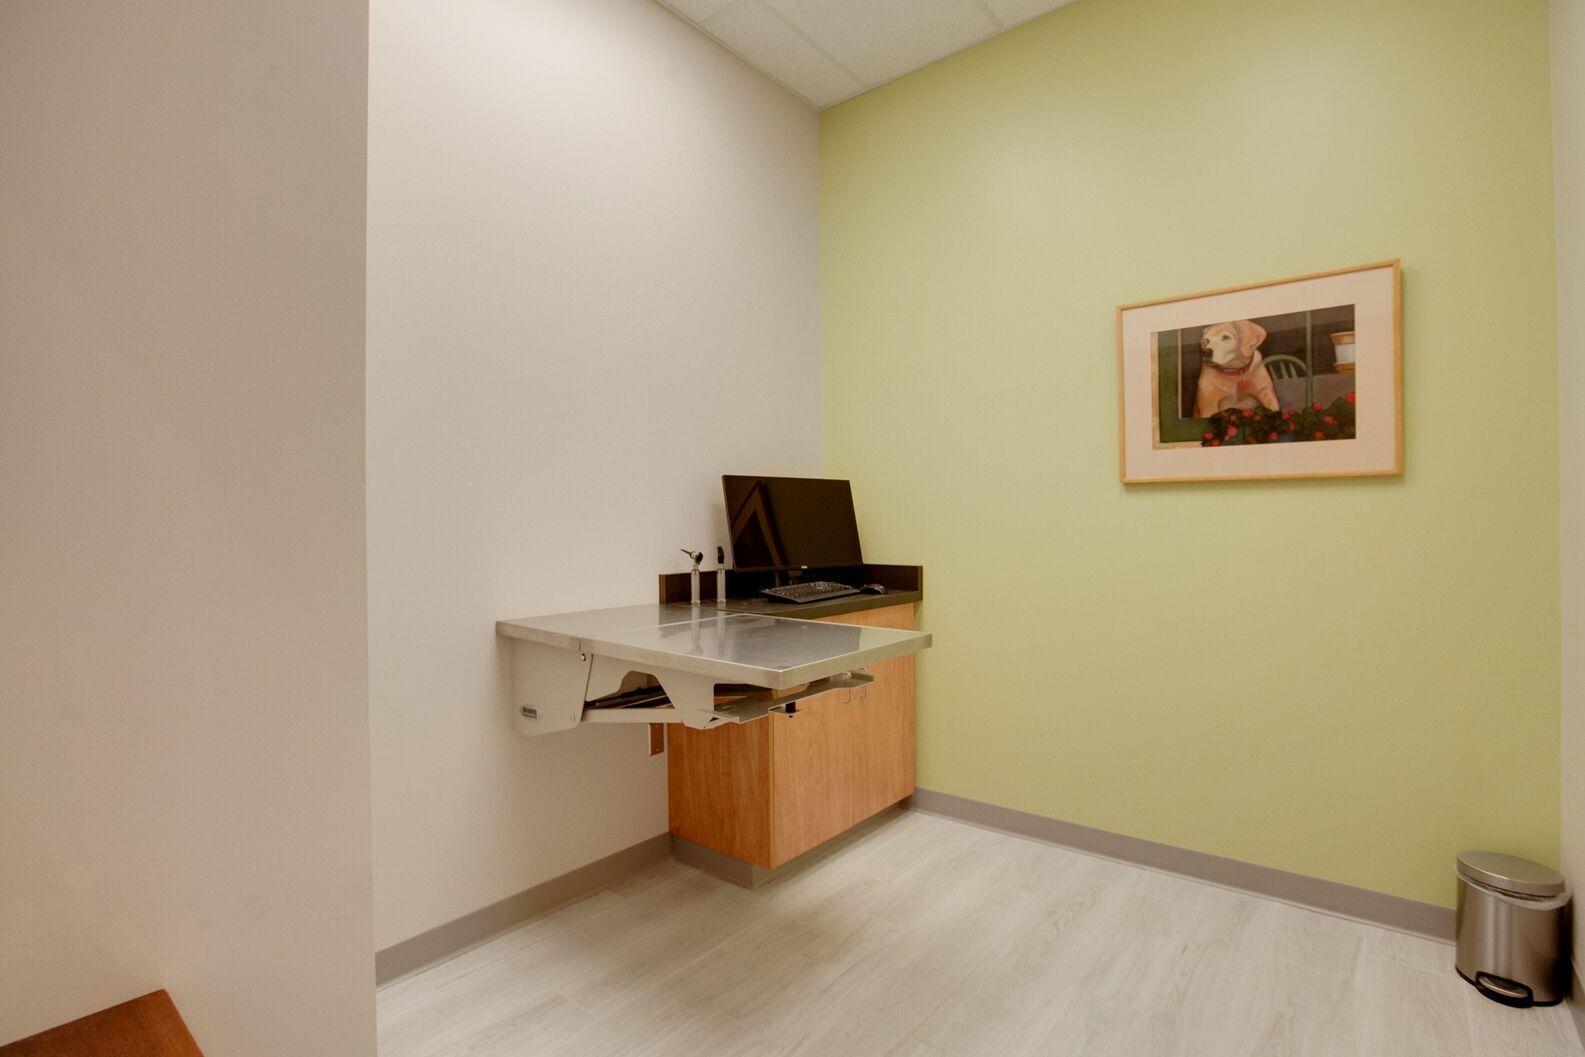 Spacious exam room at Vet Partners Edina constructed by Scott Build.